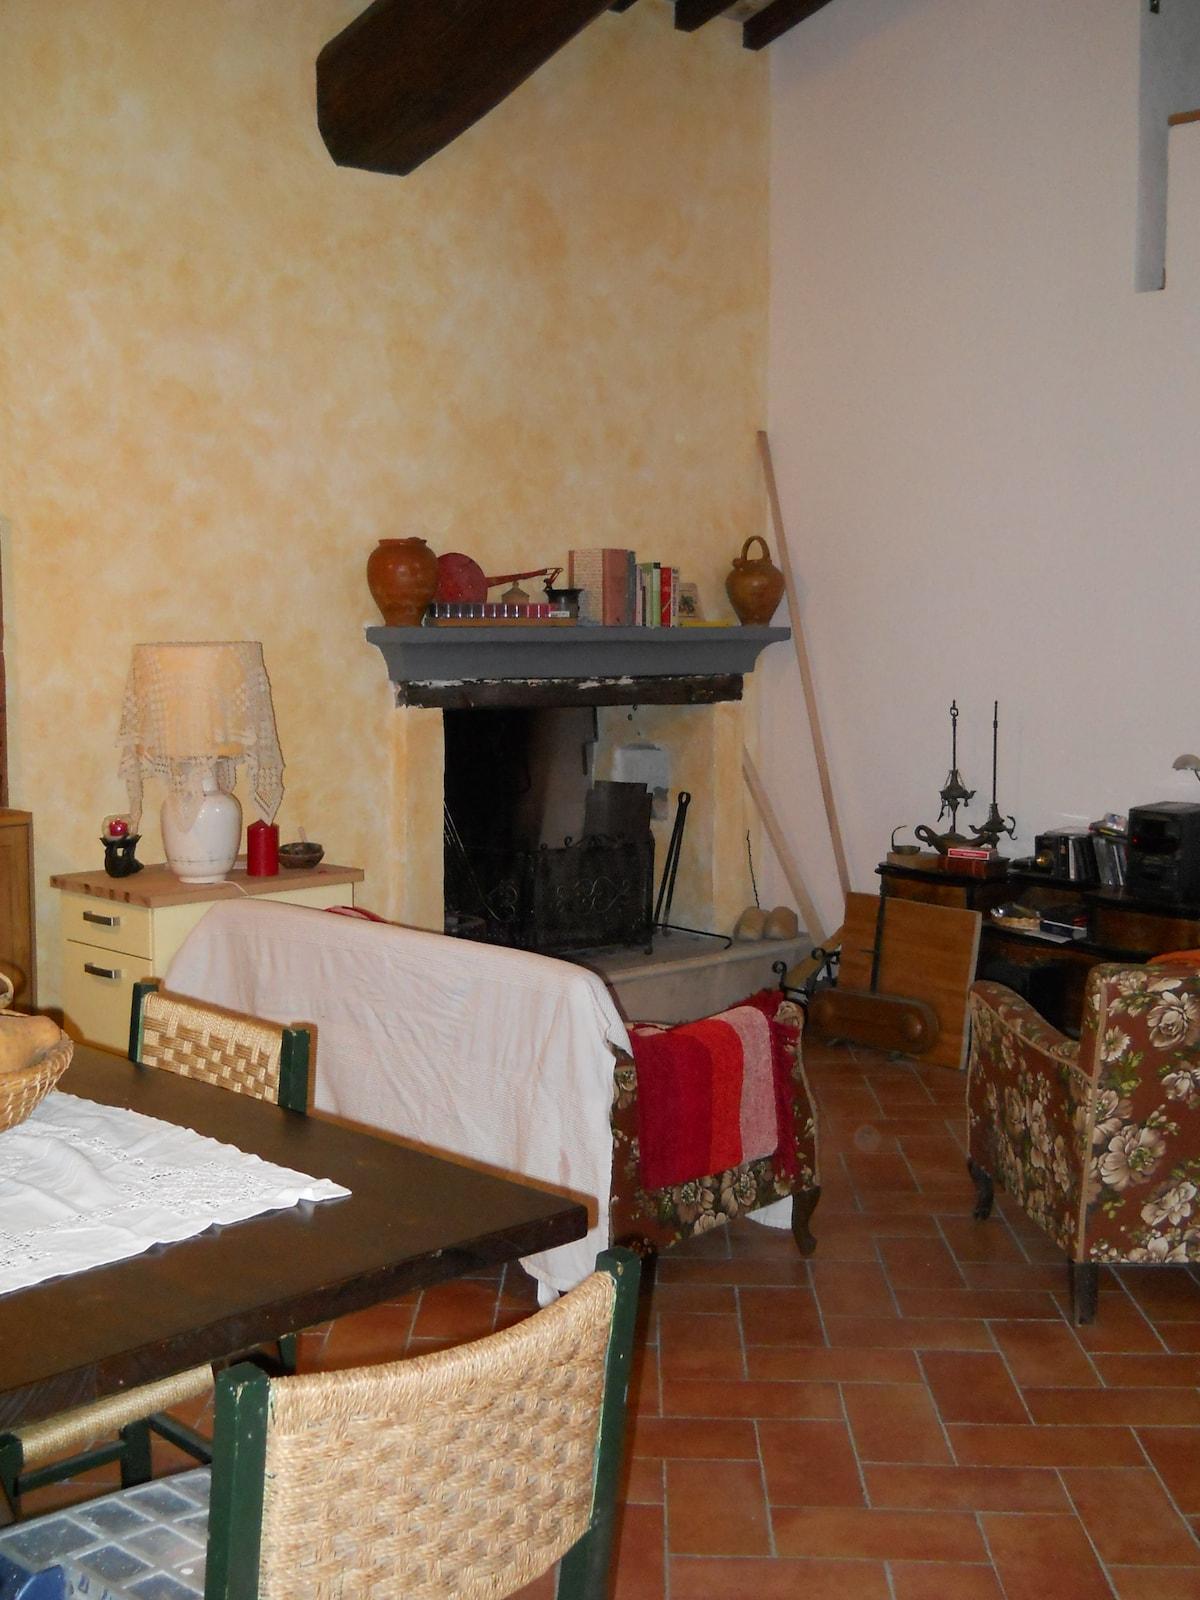 Soggiorno pranzo con vista sul camino Living/dining room with view to the fireplace